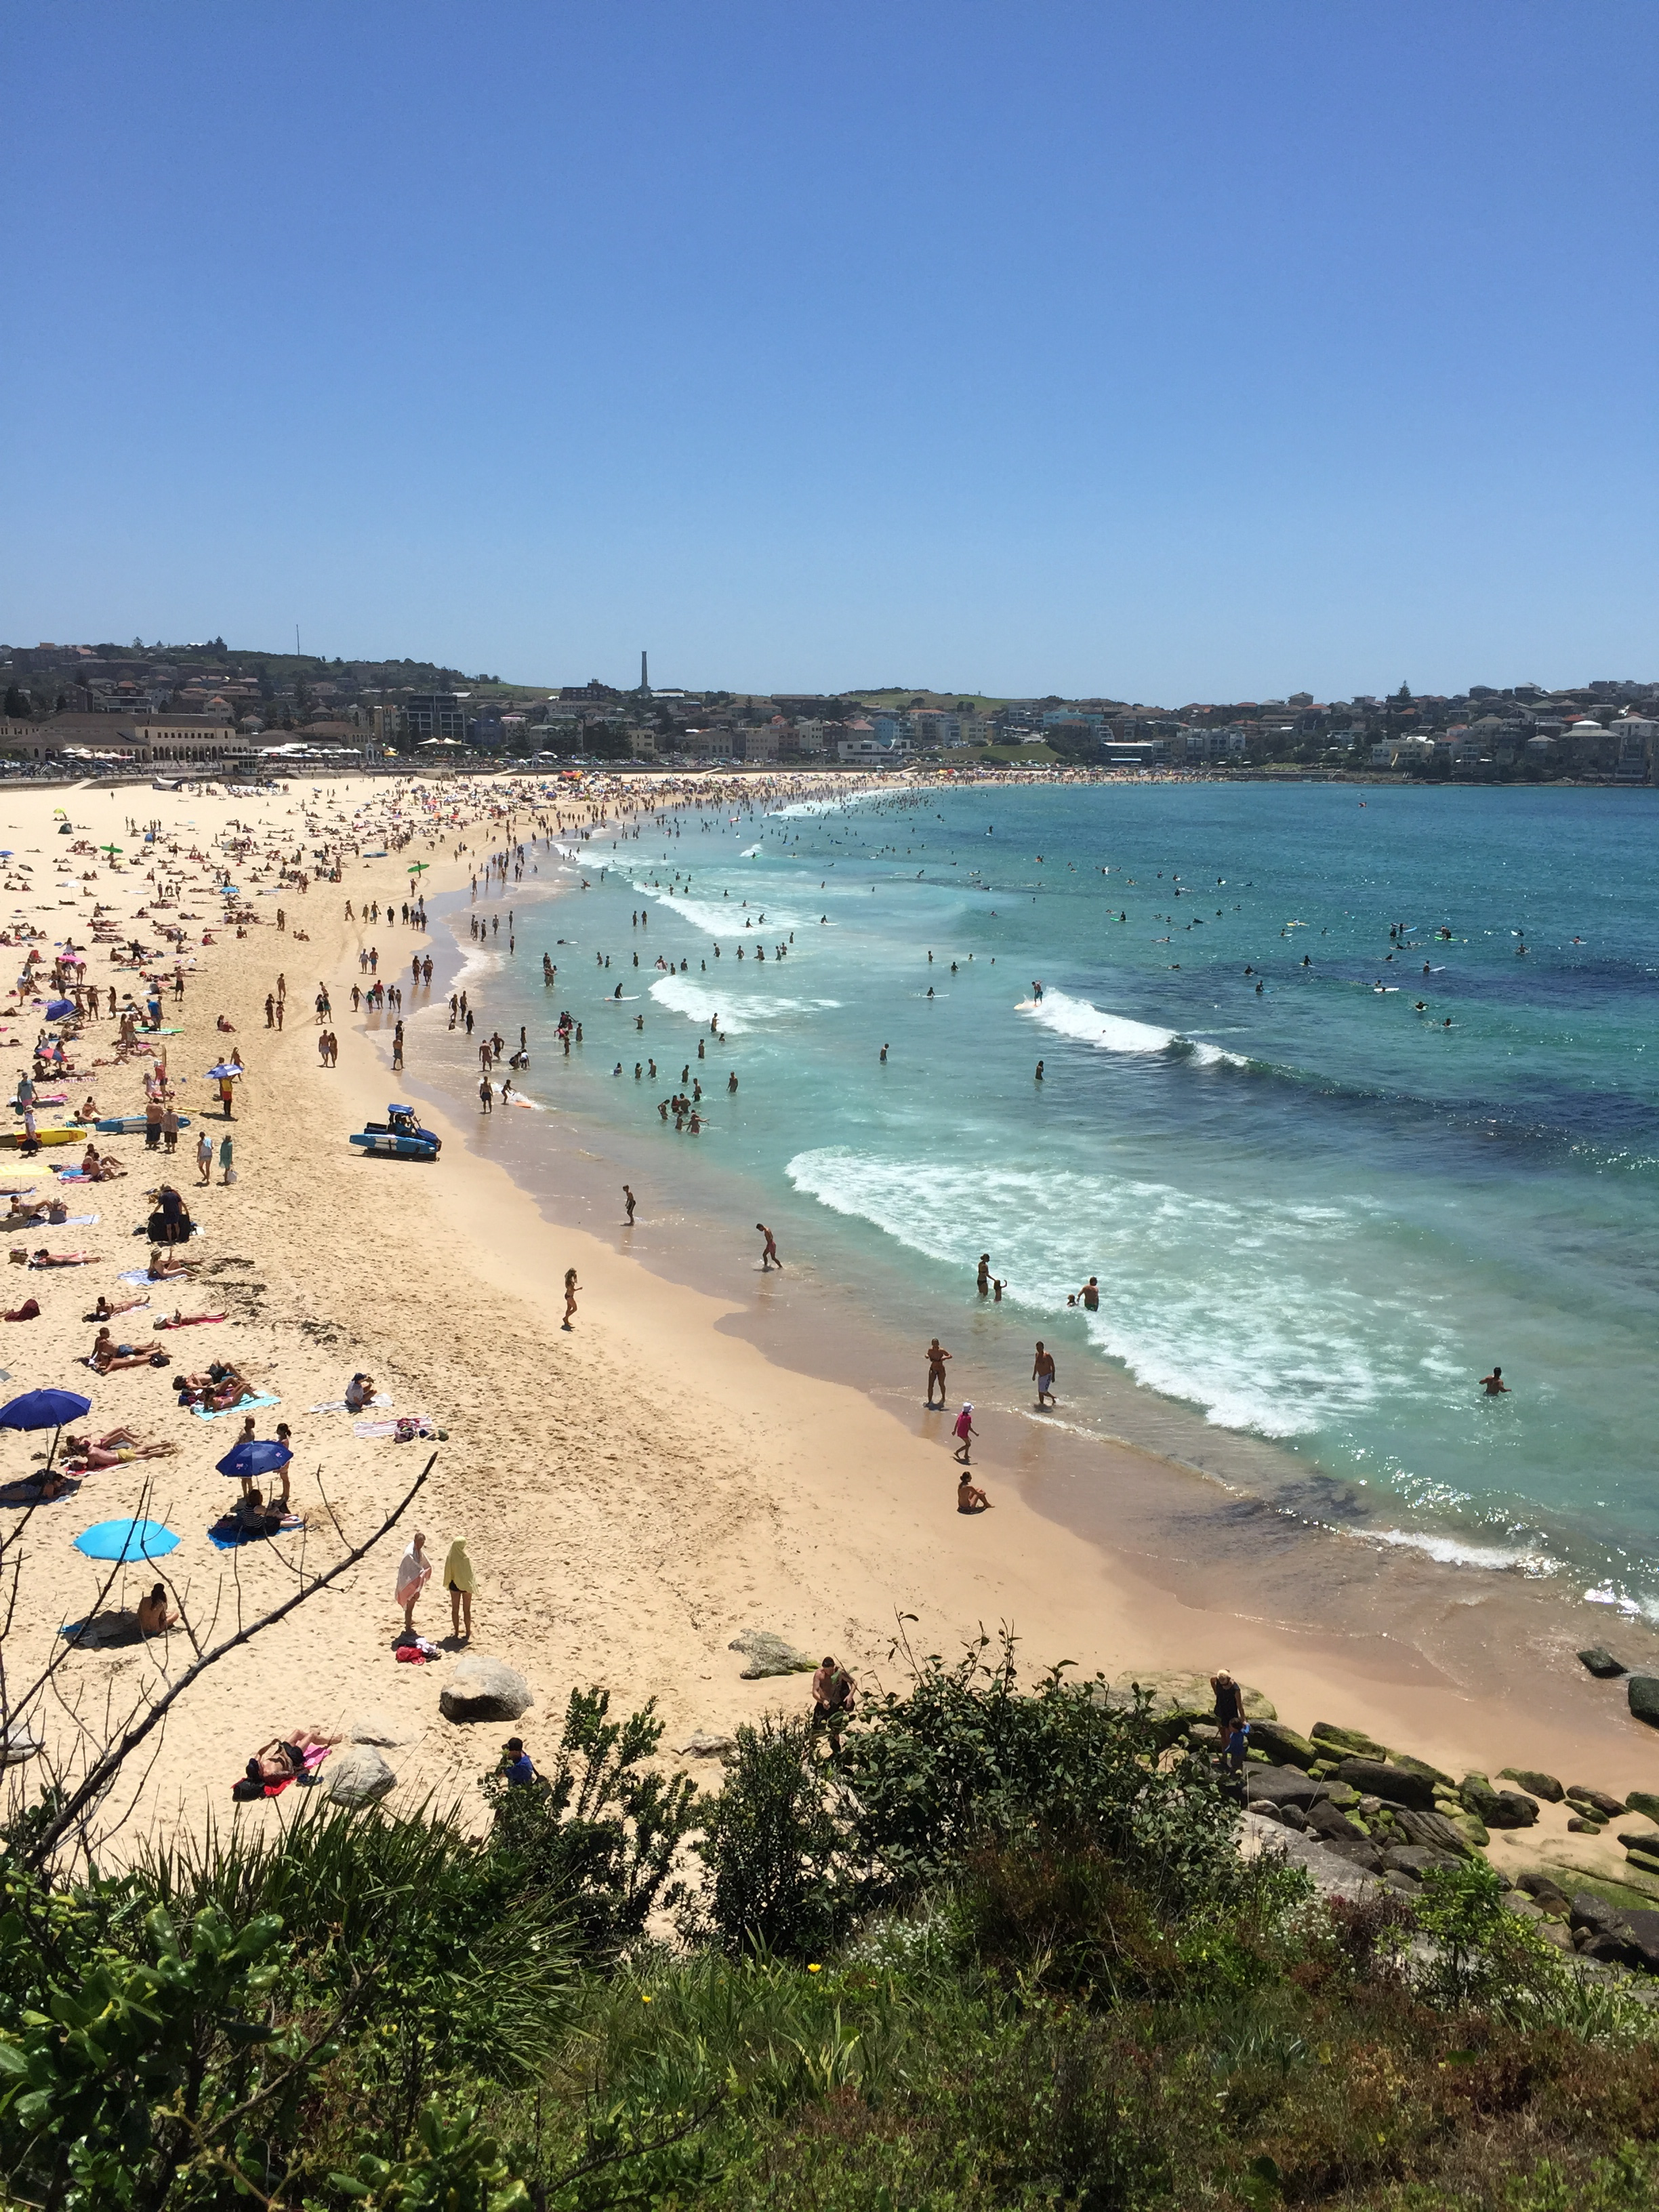 Aerial photo of sandy beach full of people.